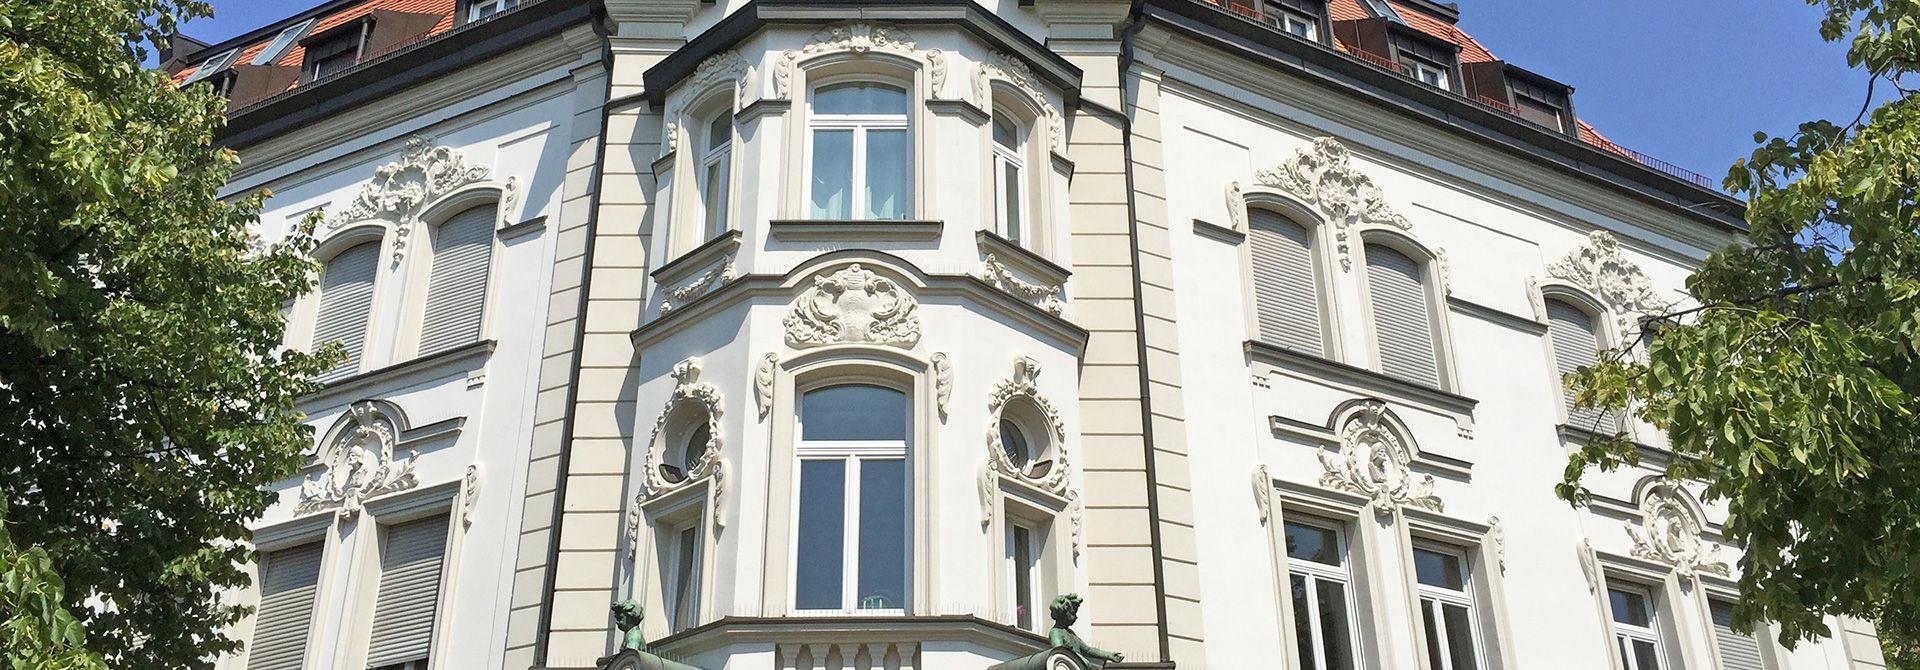 Hausverwaltung in Kirchheim